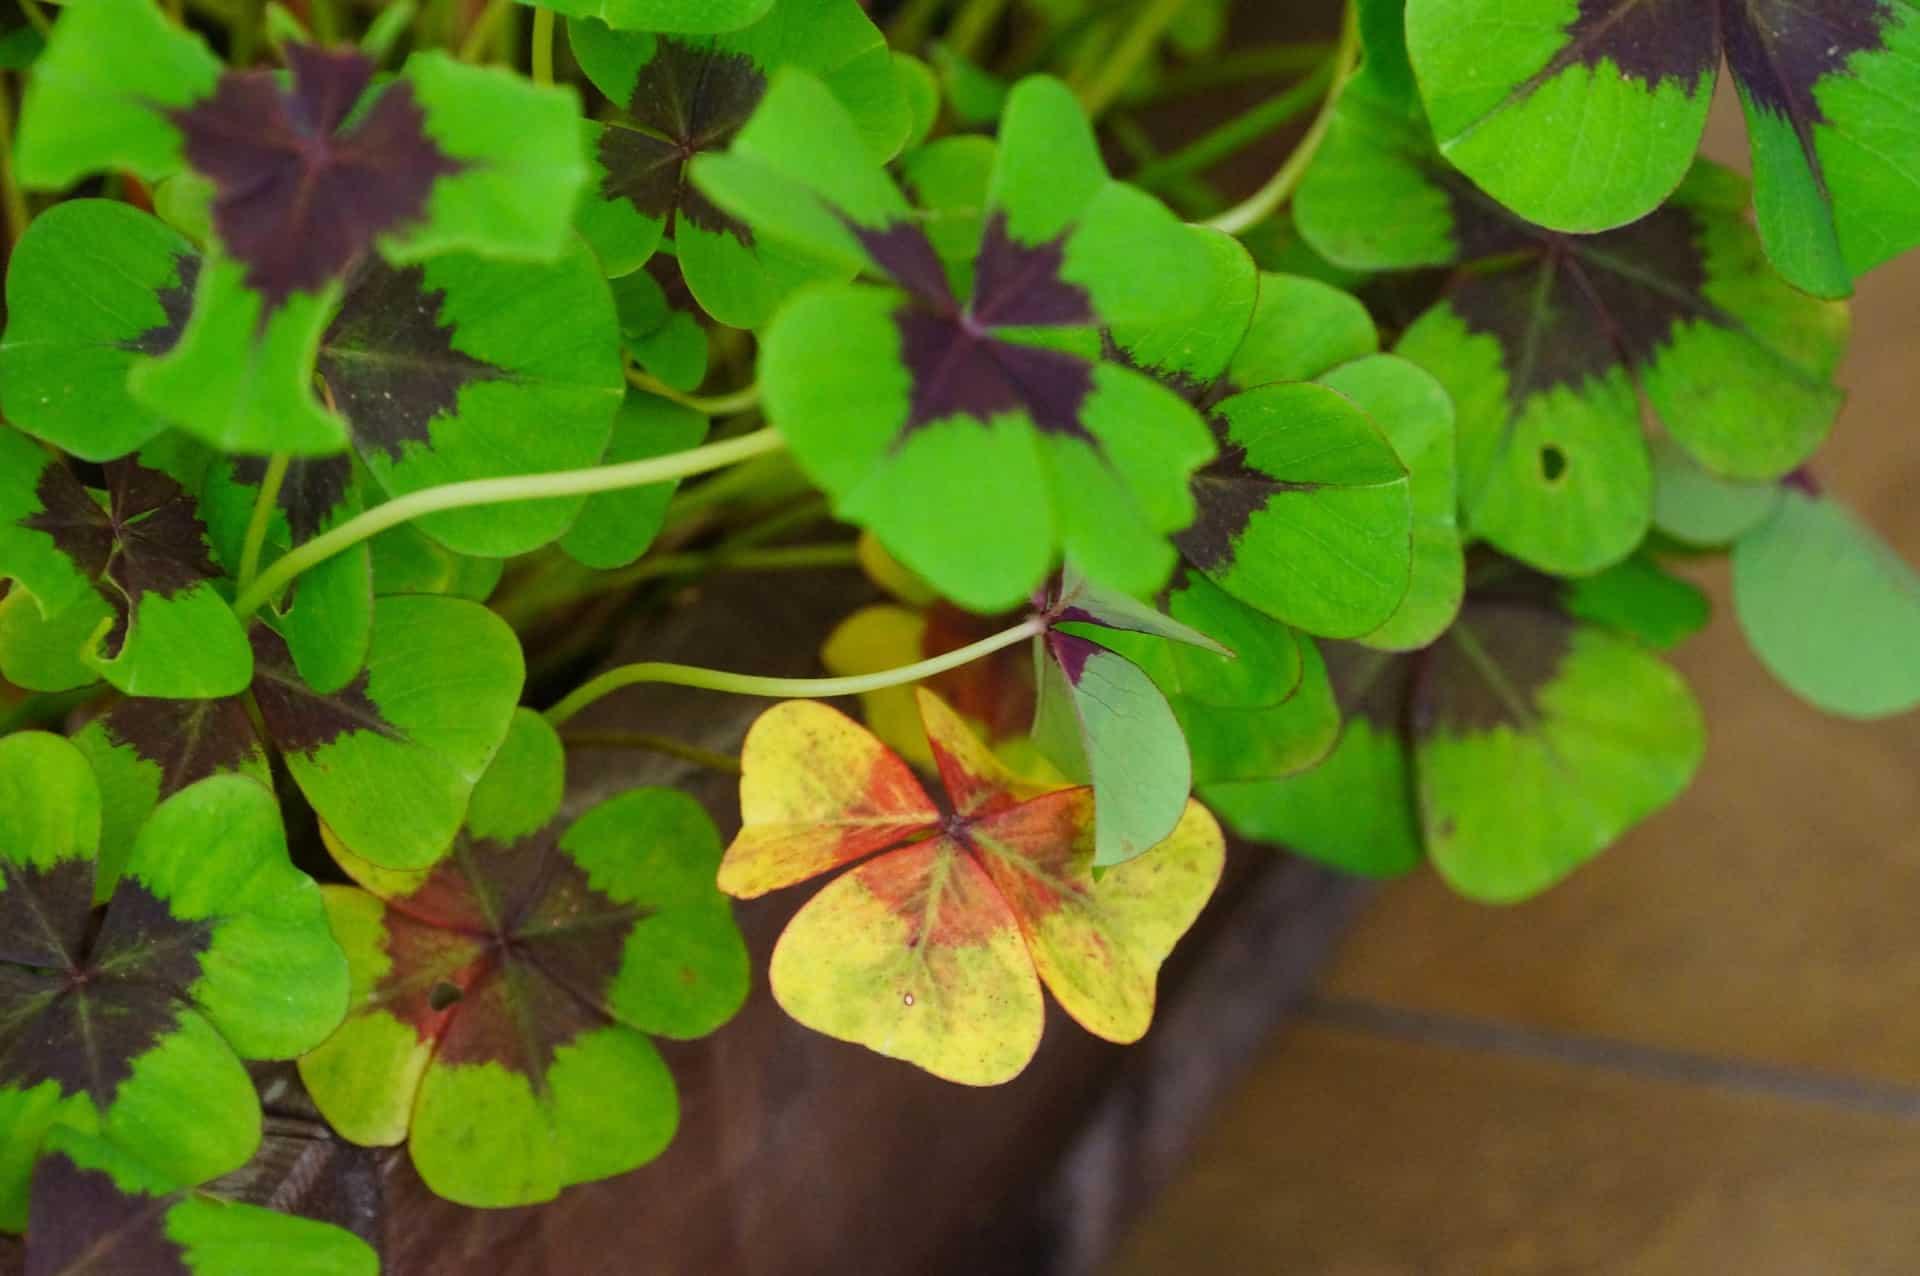 Wood sorrel leaves look like shamrocks.